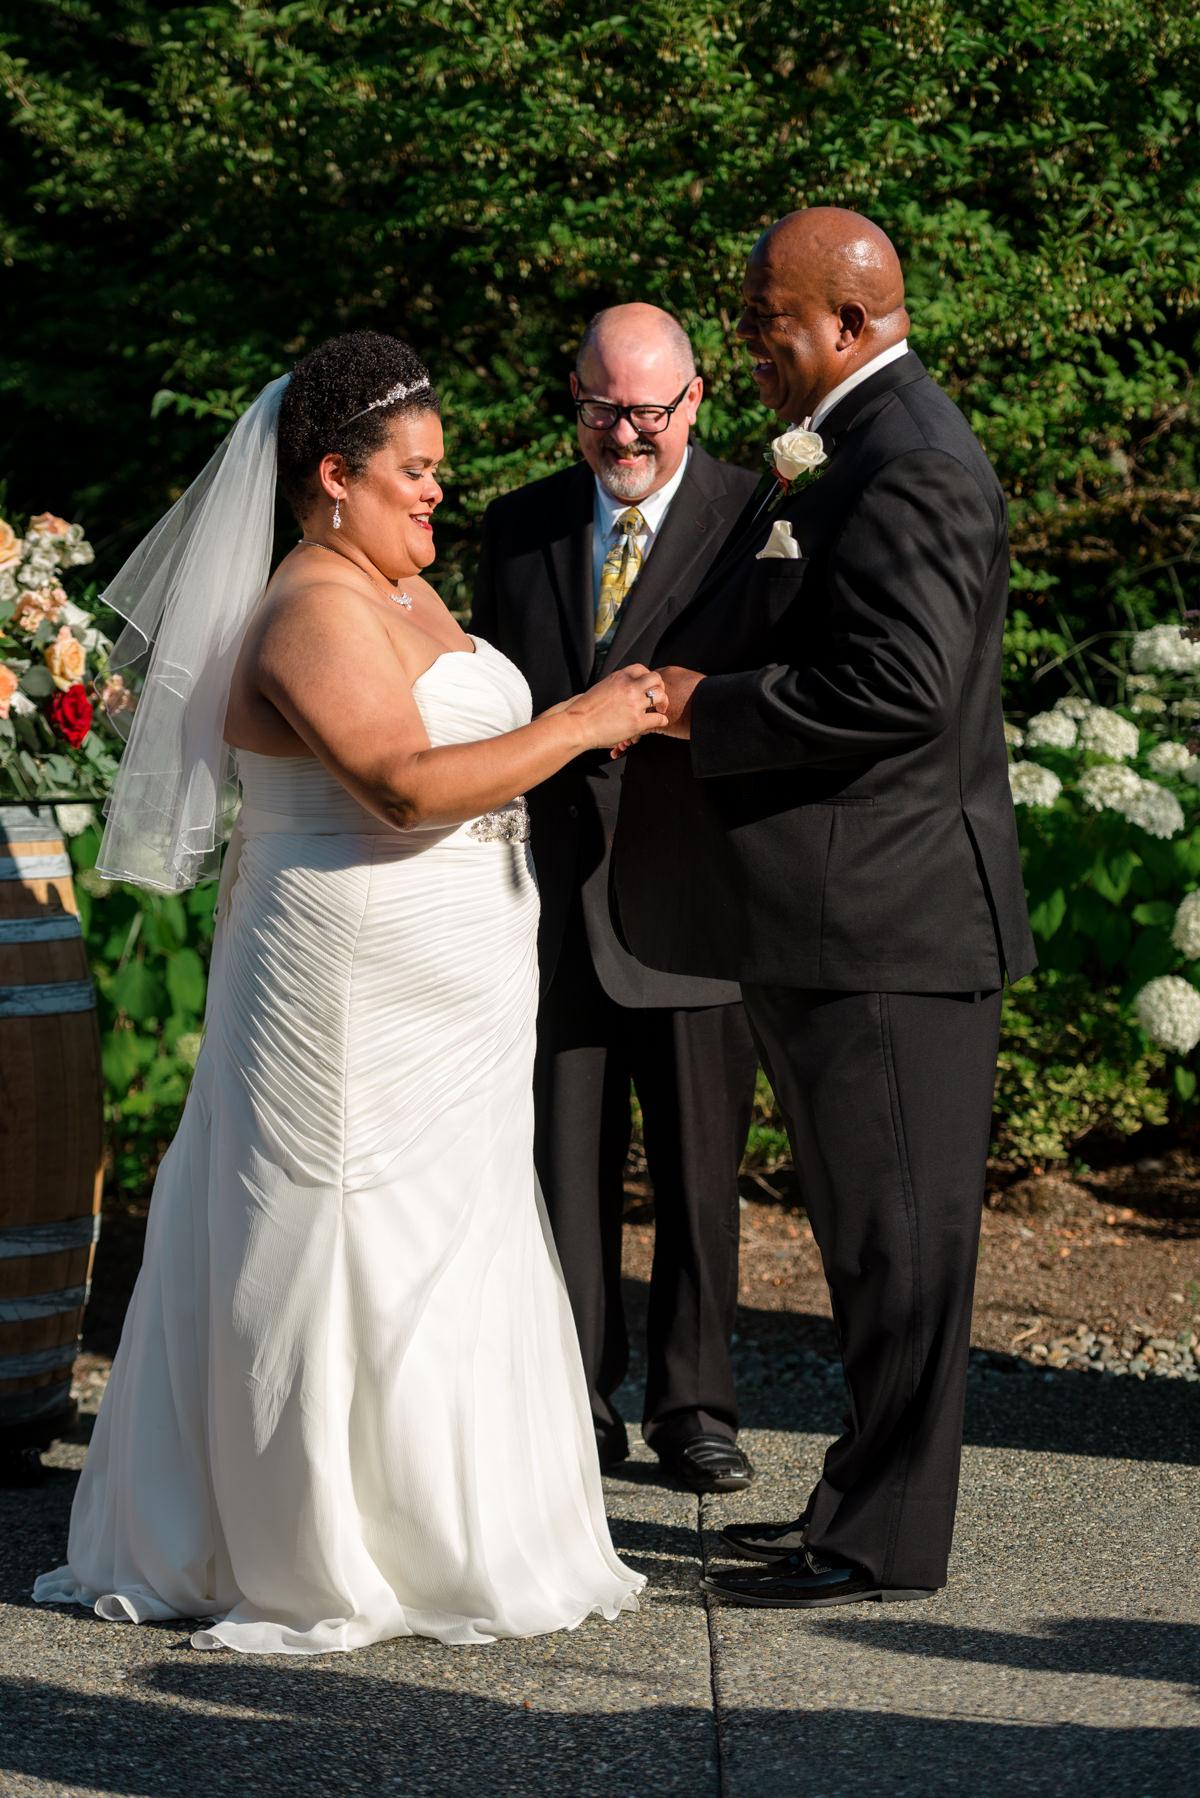 Andrew Tat - Documentary Wedding Photography - Columbia Winery - Woodinville, Washington -Patricia & Teffin - 14.jpg